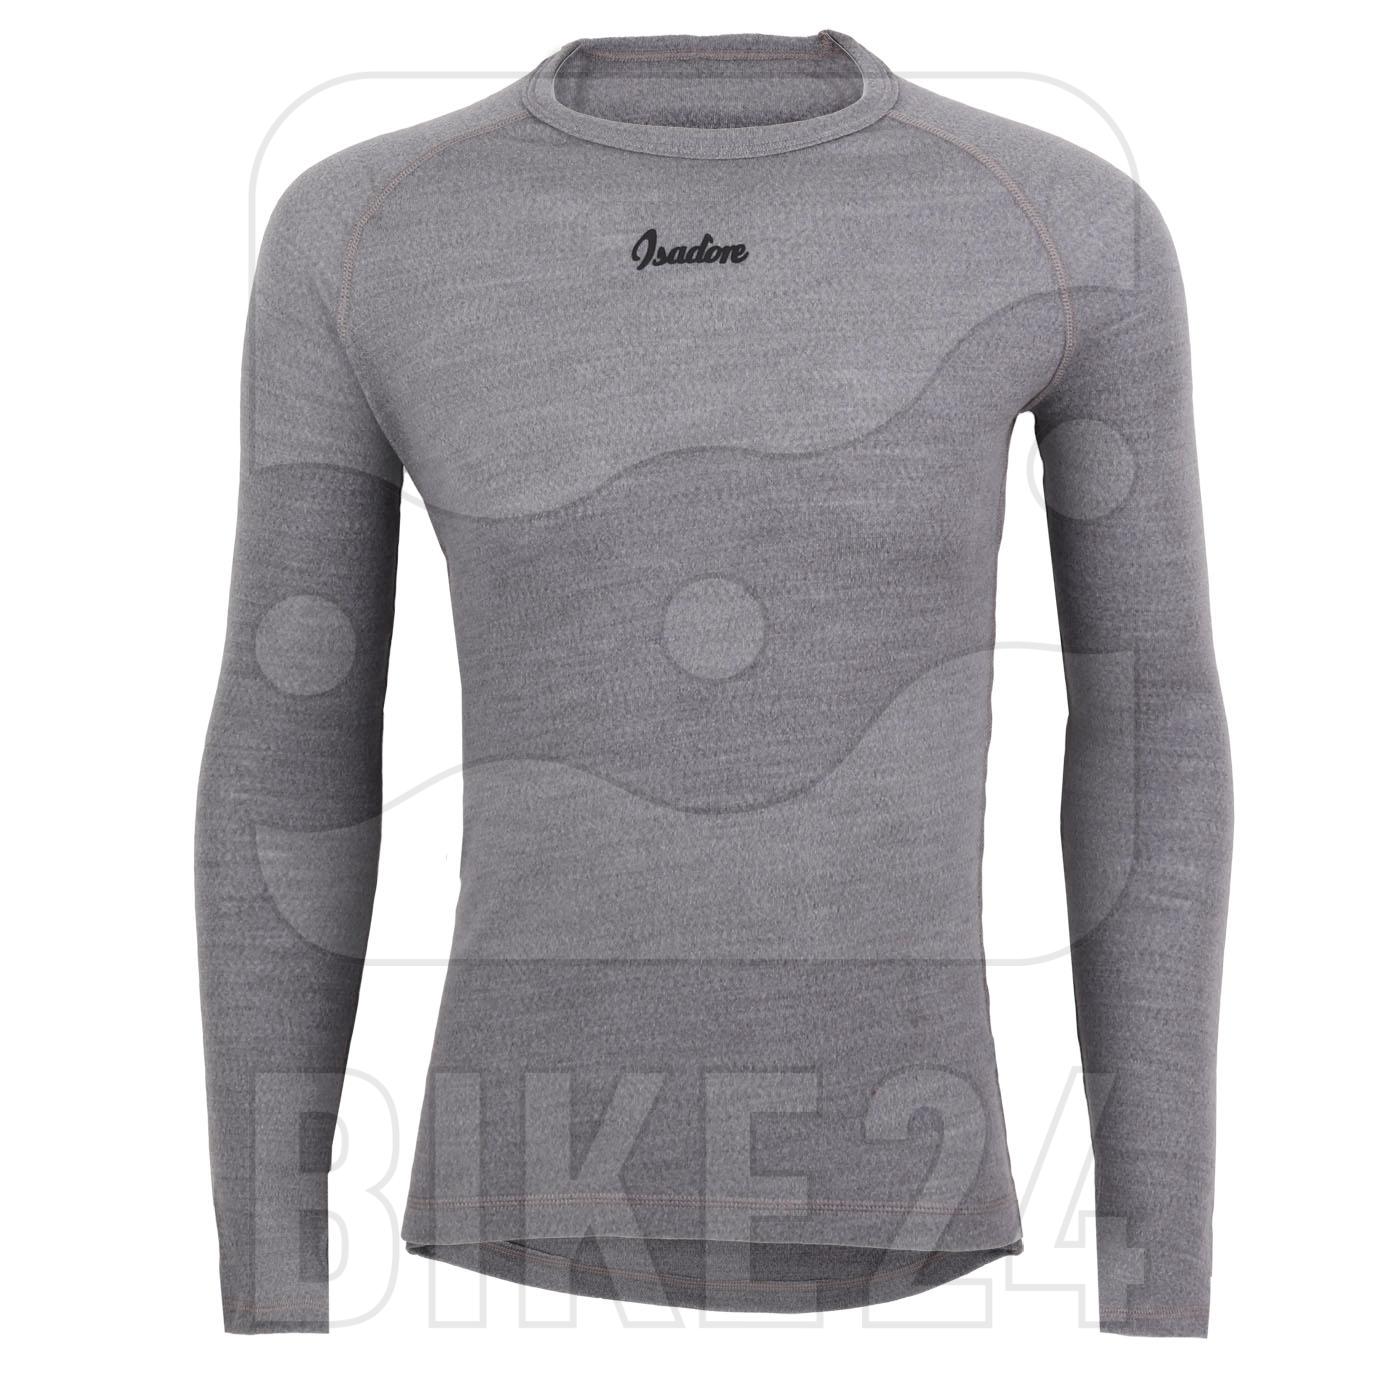 Isadore 100% Merino Long Sleeve Baselayer - Grey